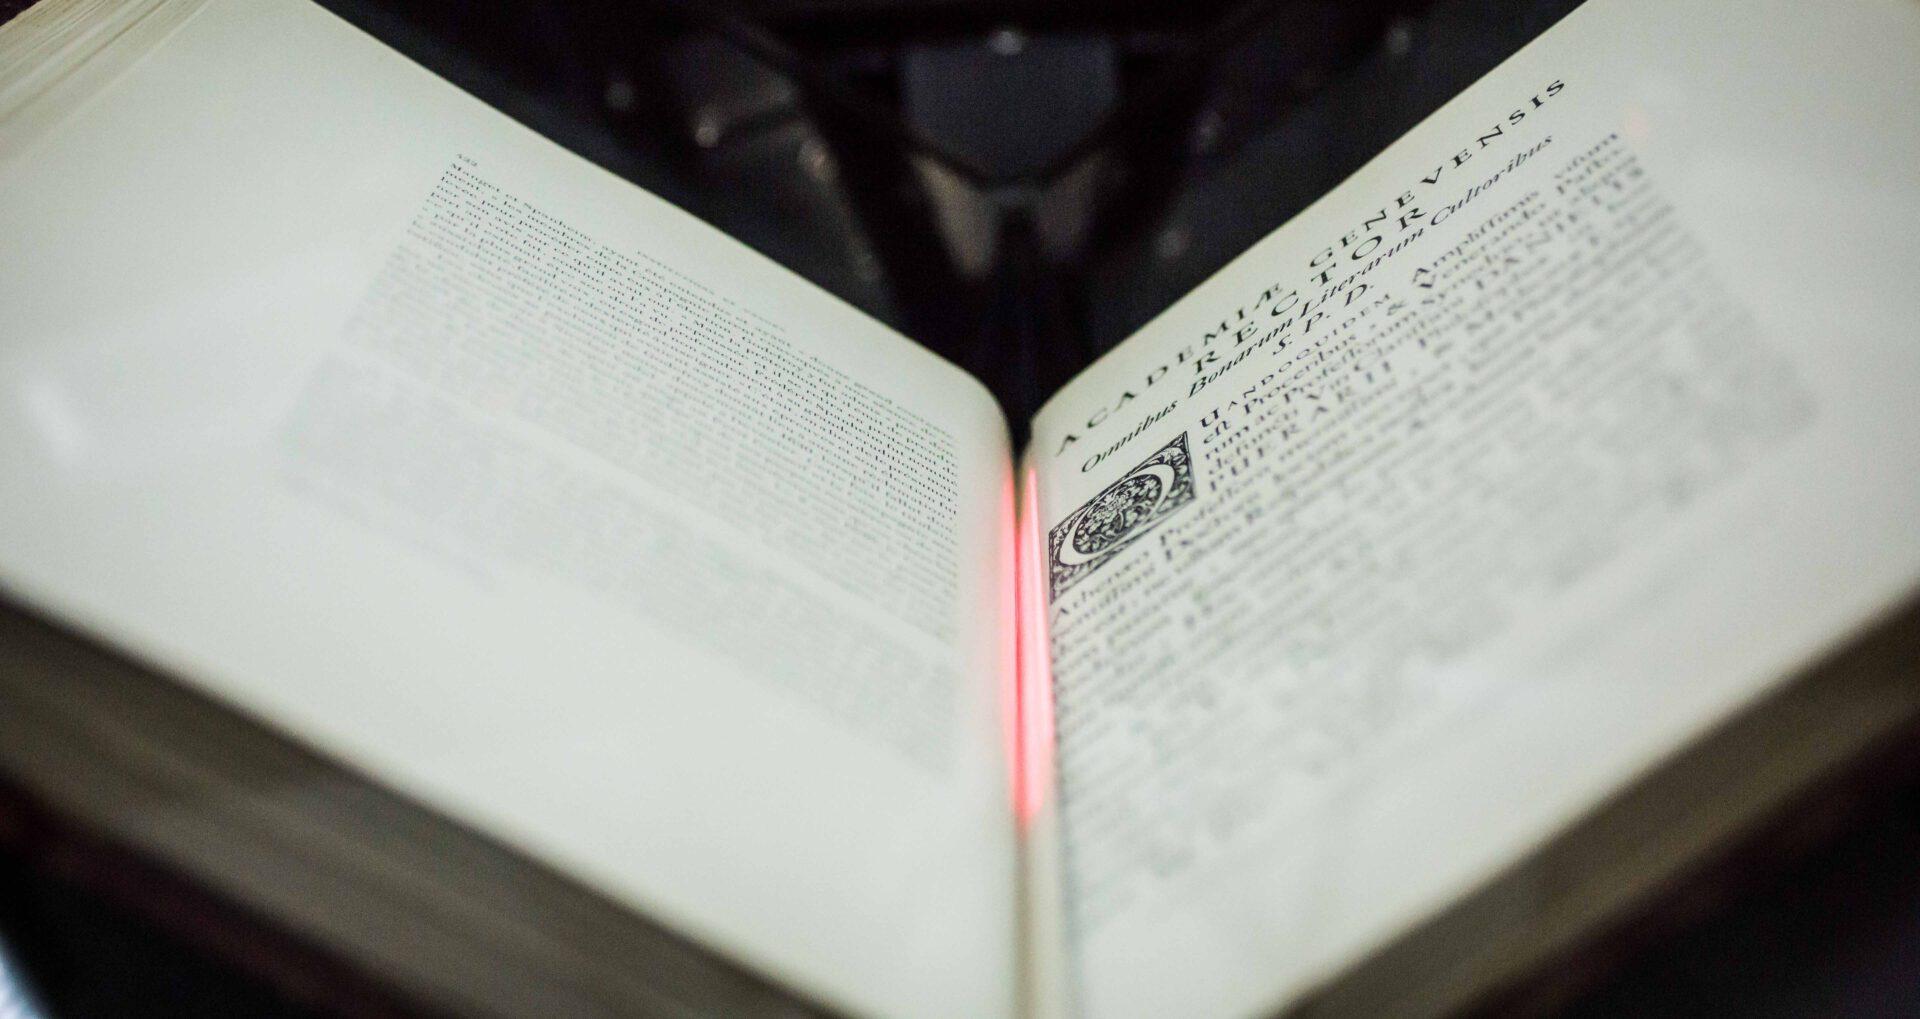 book2net Buchscanner - Tiefenschärfe